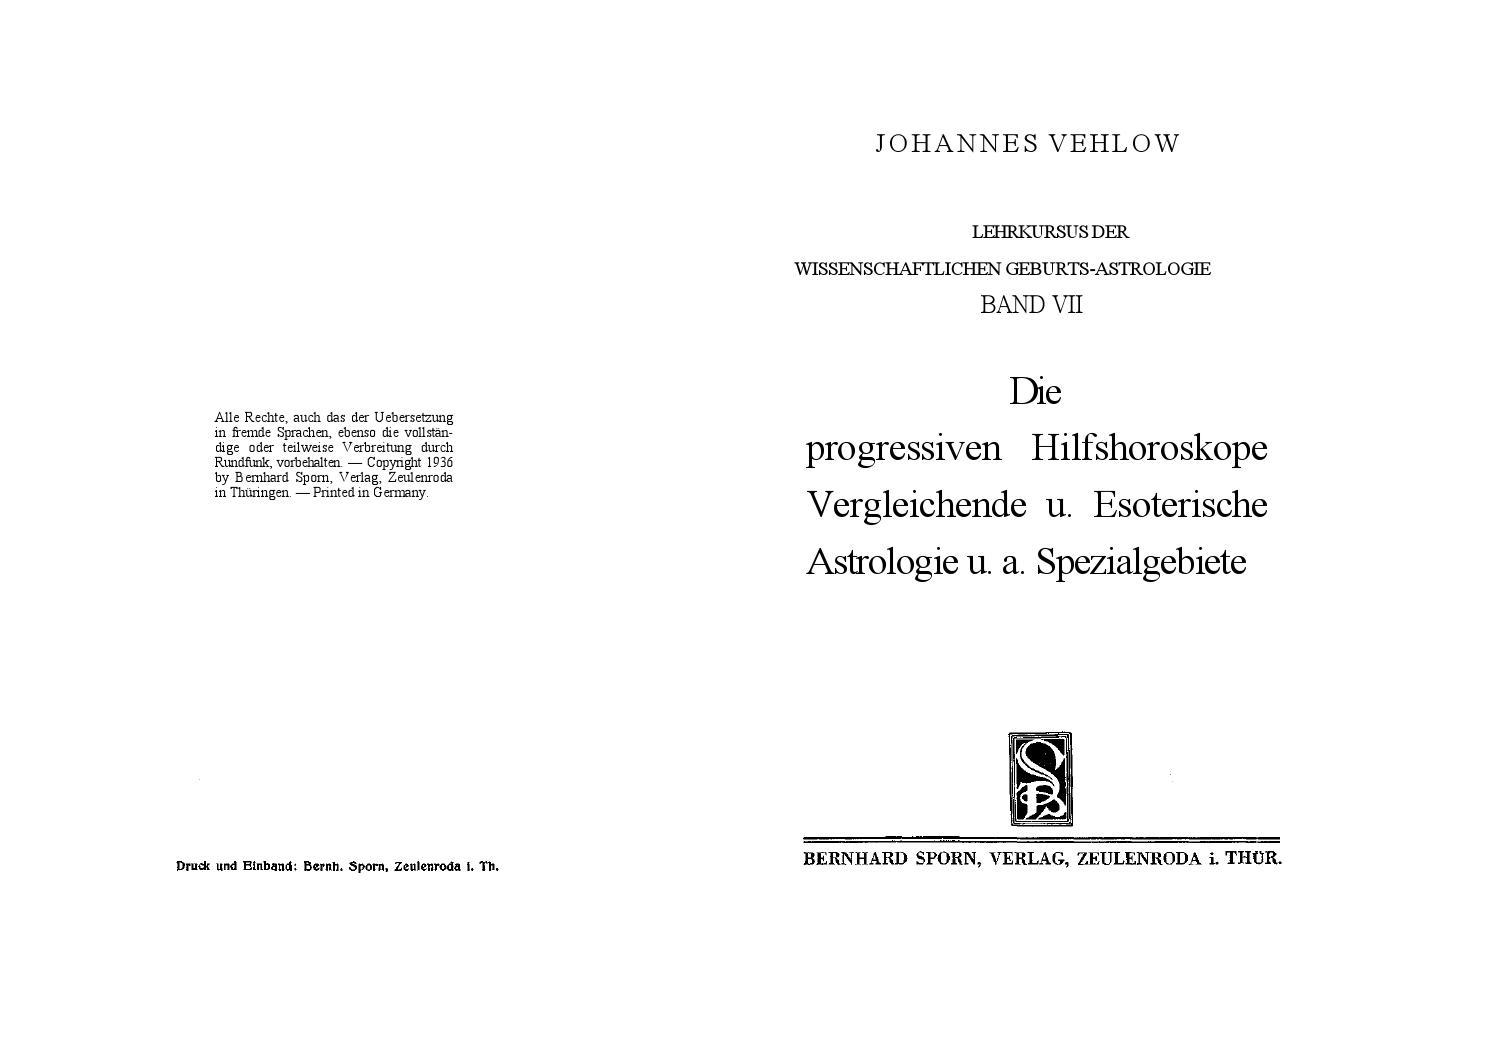 Johannes vehlow band vii by Umn Him - issuu